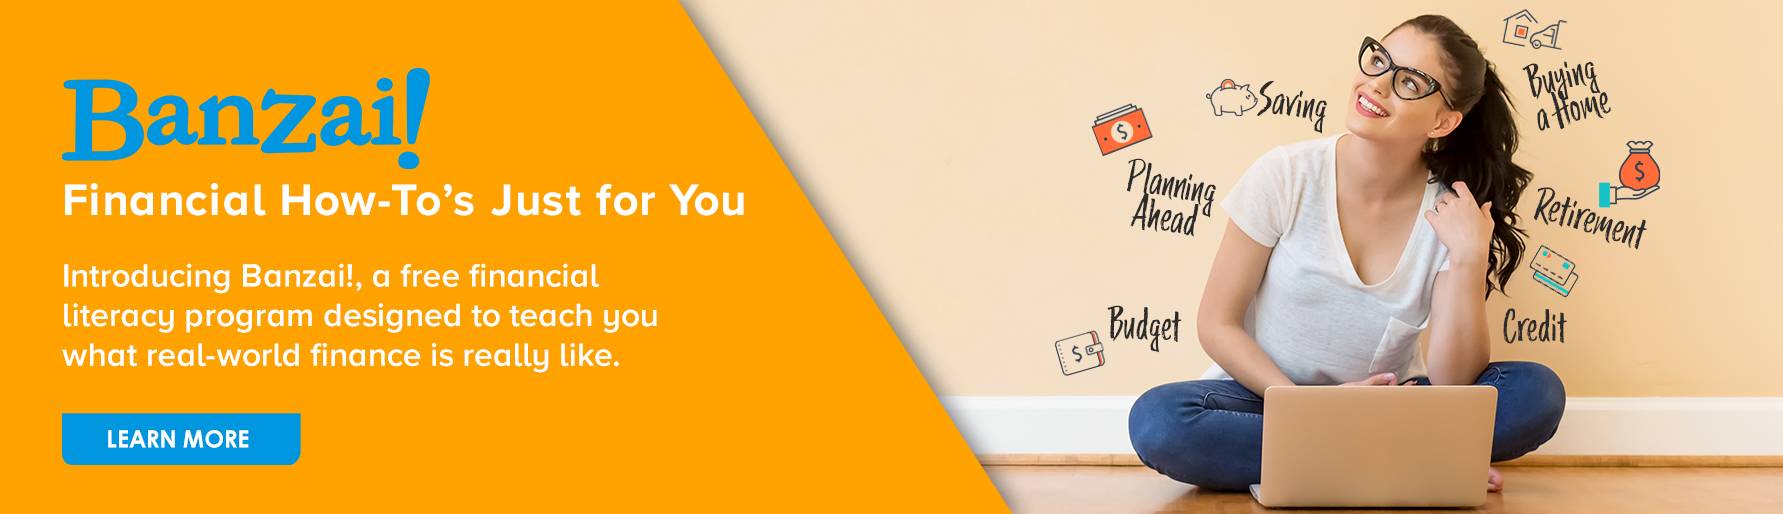 Banzai Financial Literacy Program Banner Ad